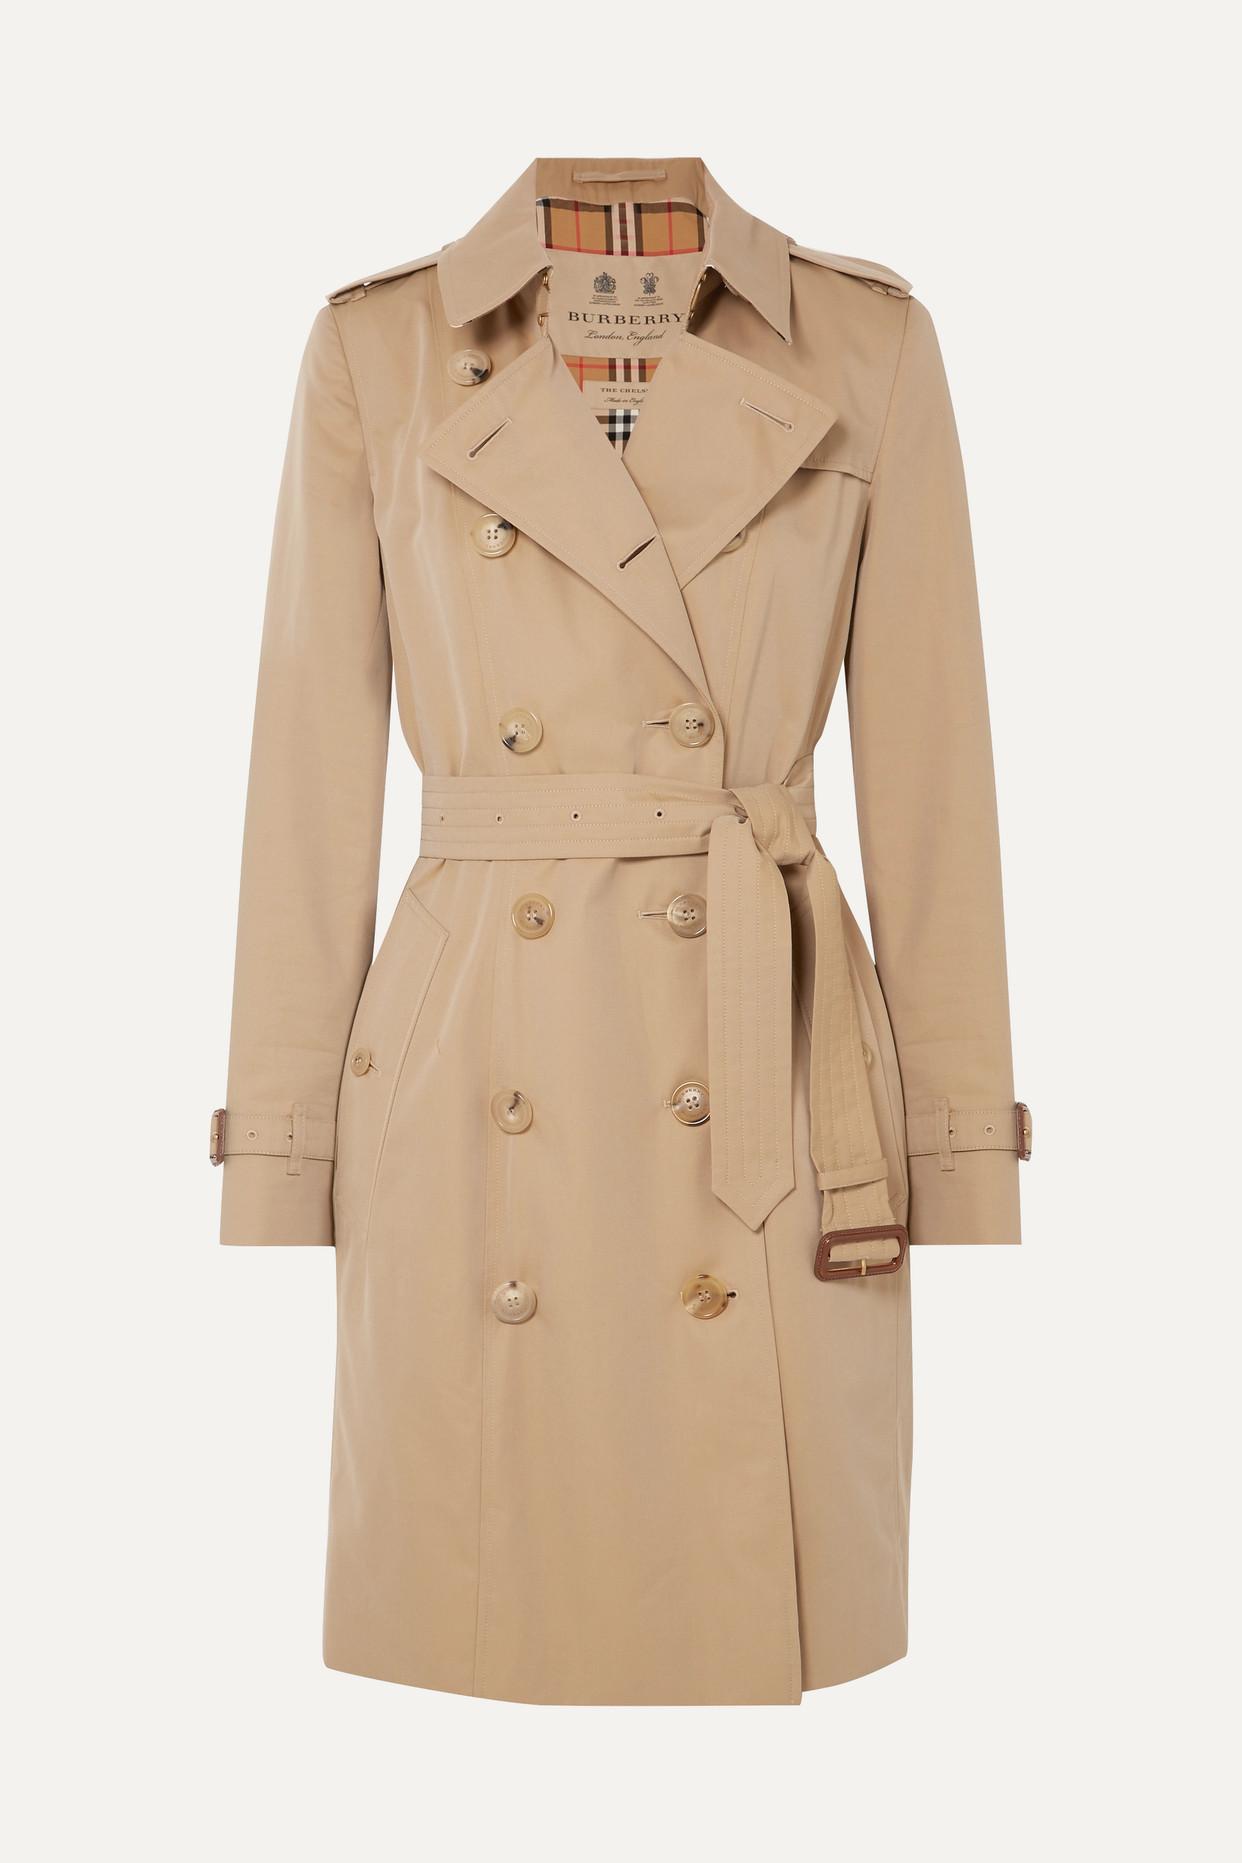 BURBERRY - The Chelsea Cotton-gabardine Trench Coat - Neutrals - UK18